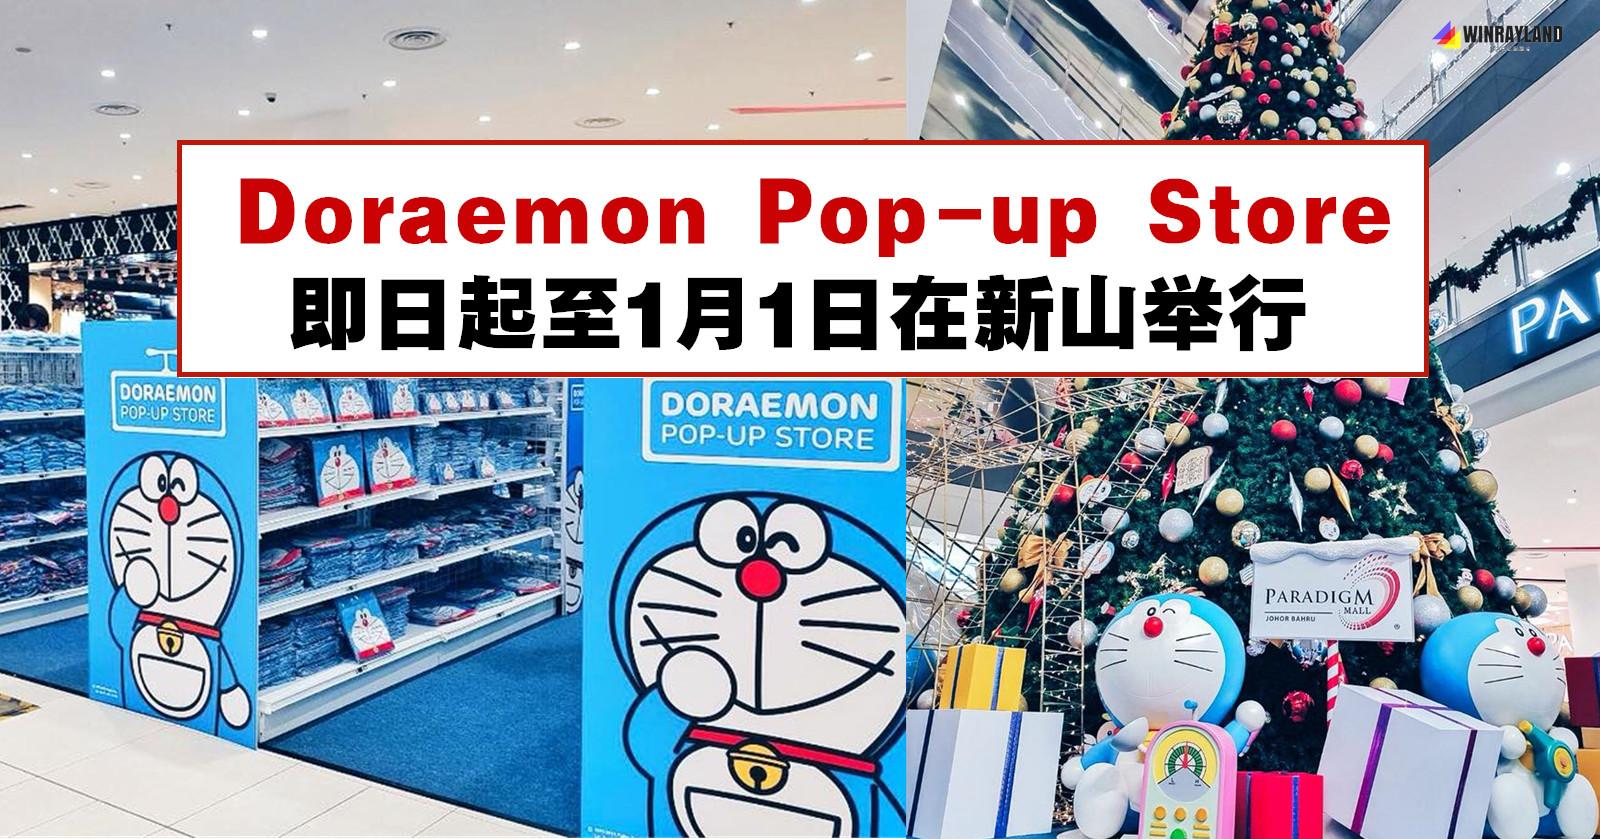 Doraemon Pop-up Store来啦!即日起至1月1日